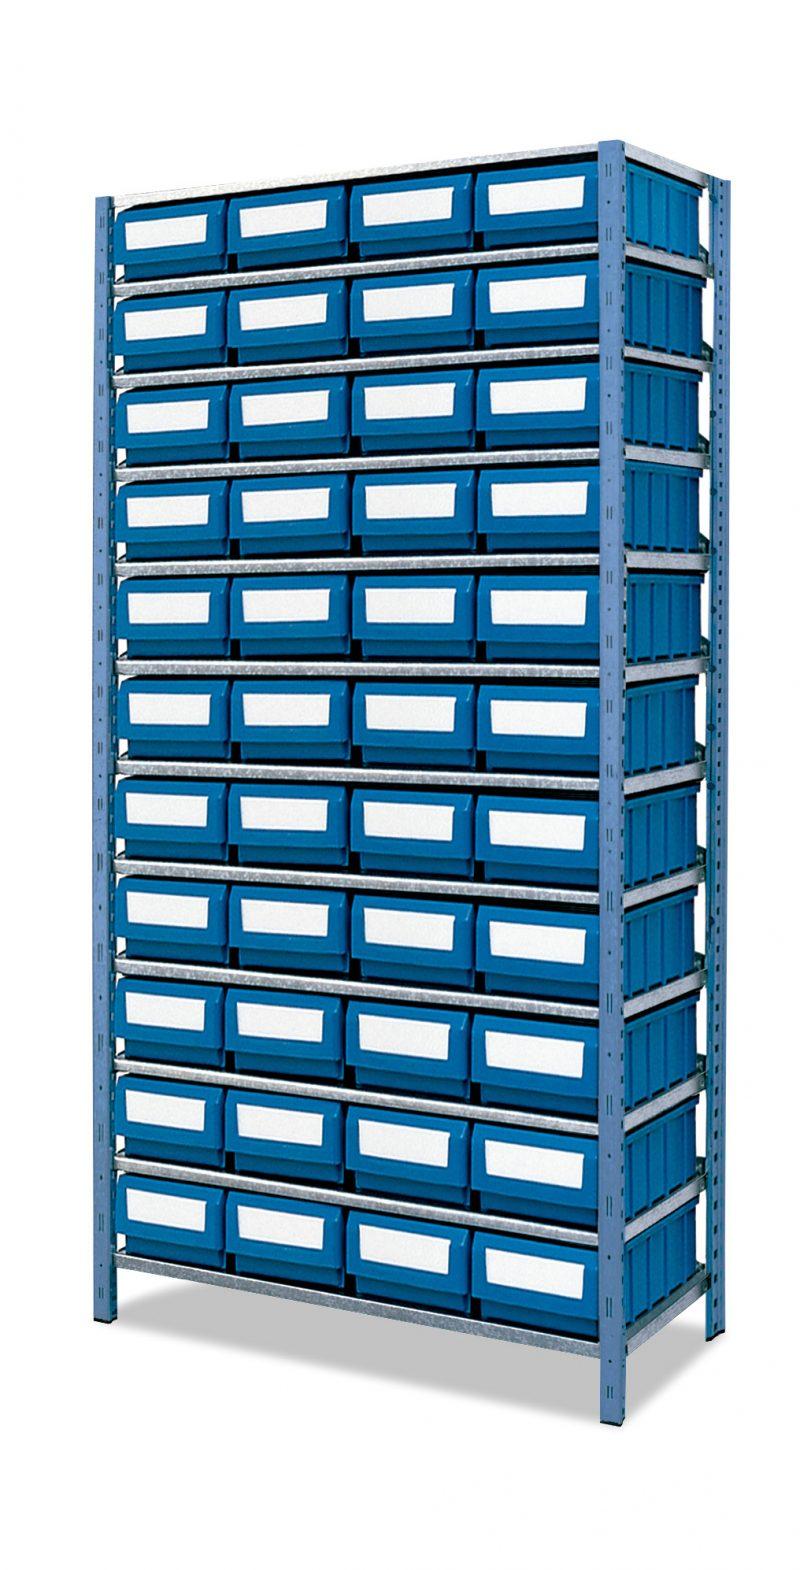 4 kit estanterias metalicas e1592468614958 - Kit estanterías metálicas